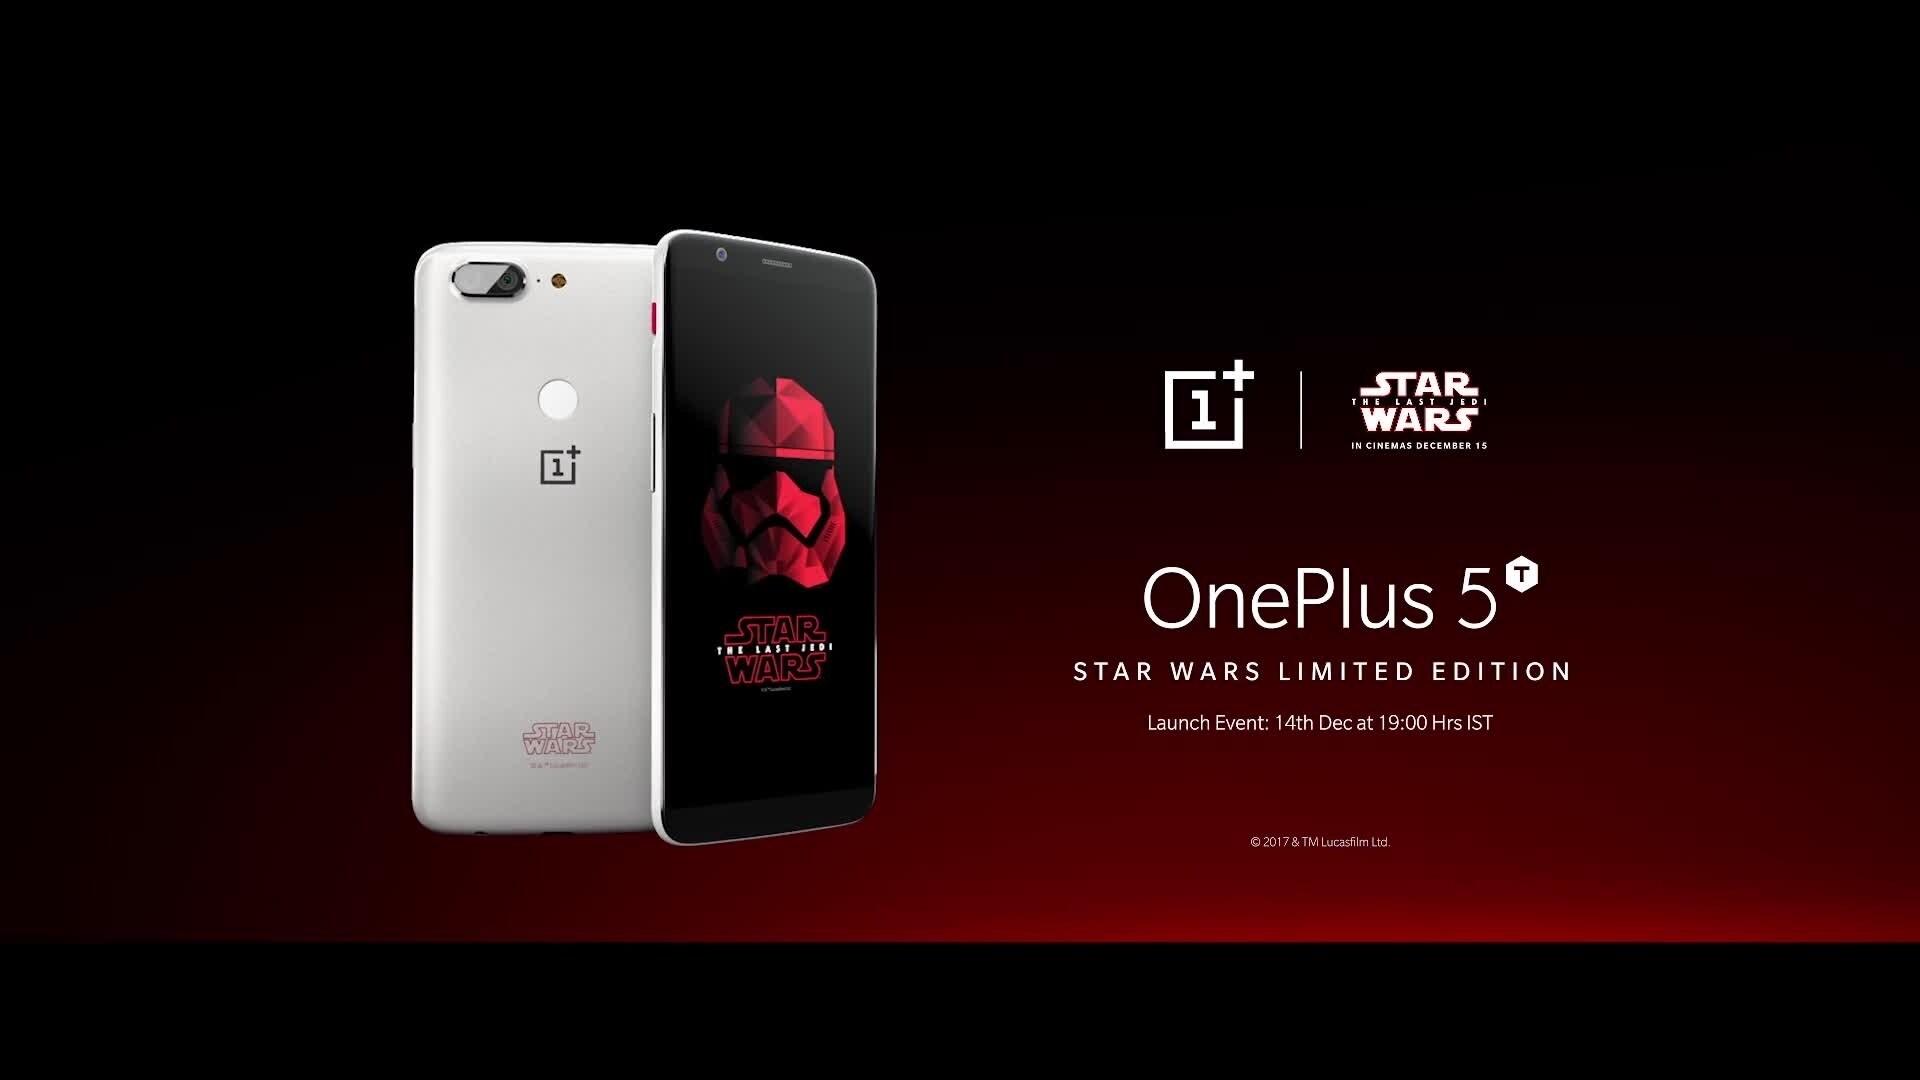 One Plus x Star Wars The Last Jedi IN